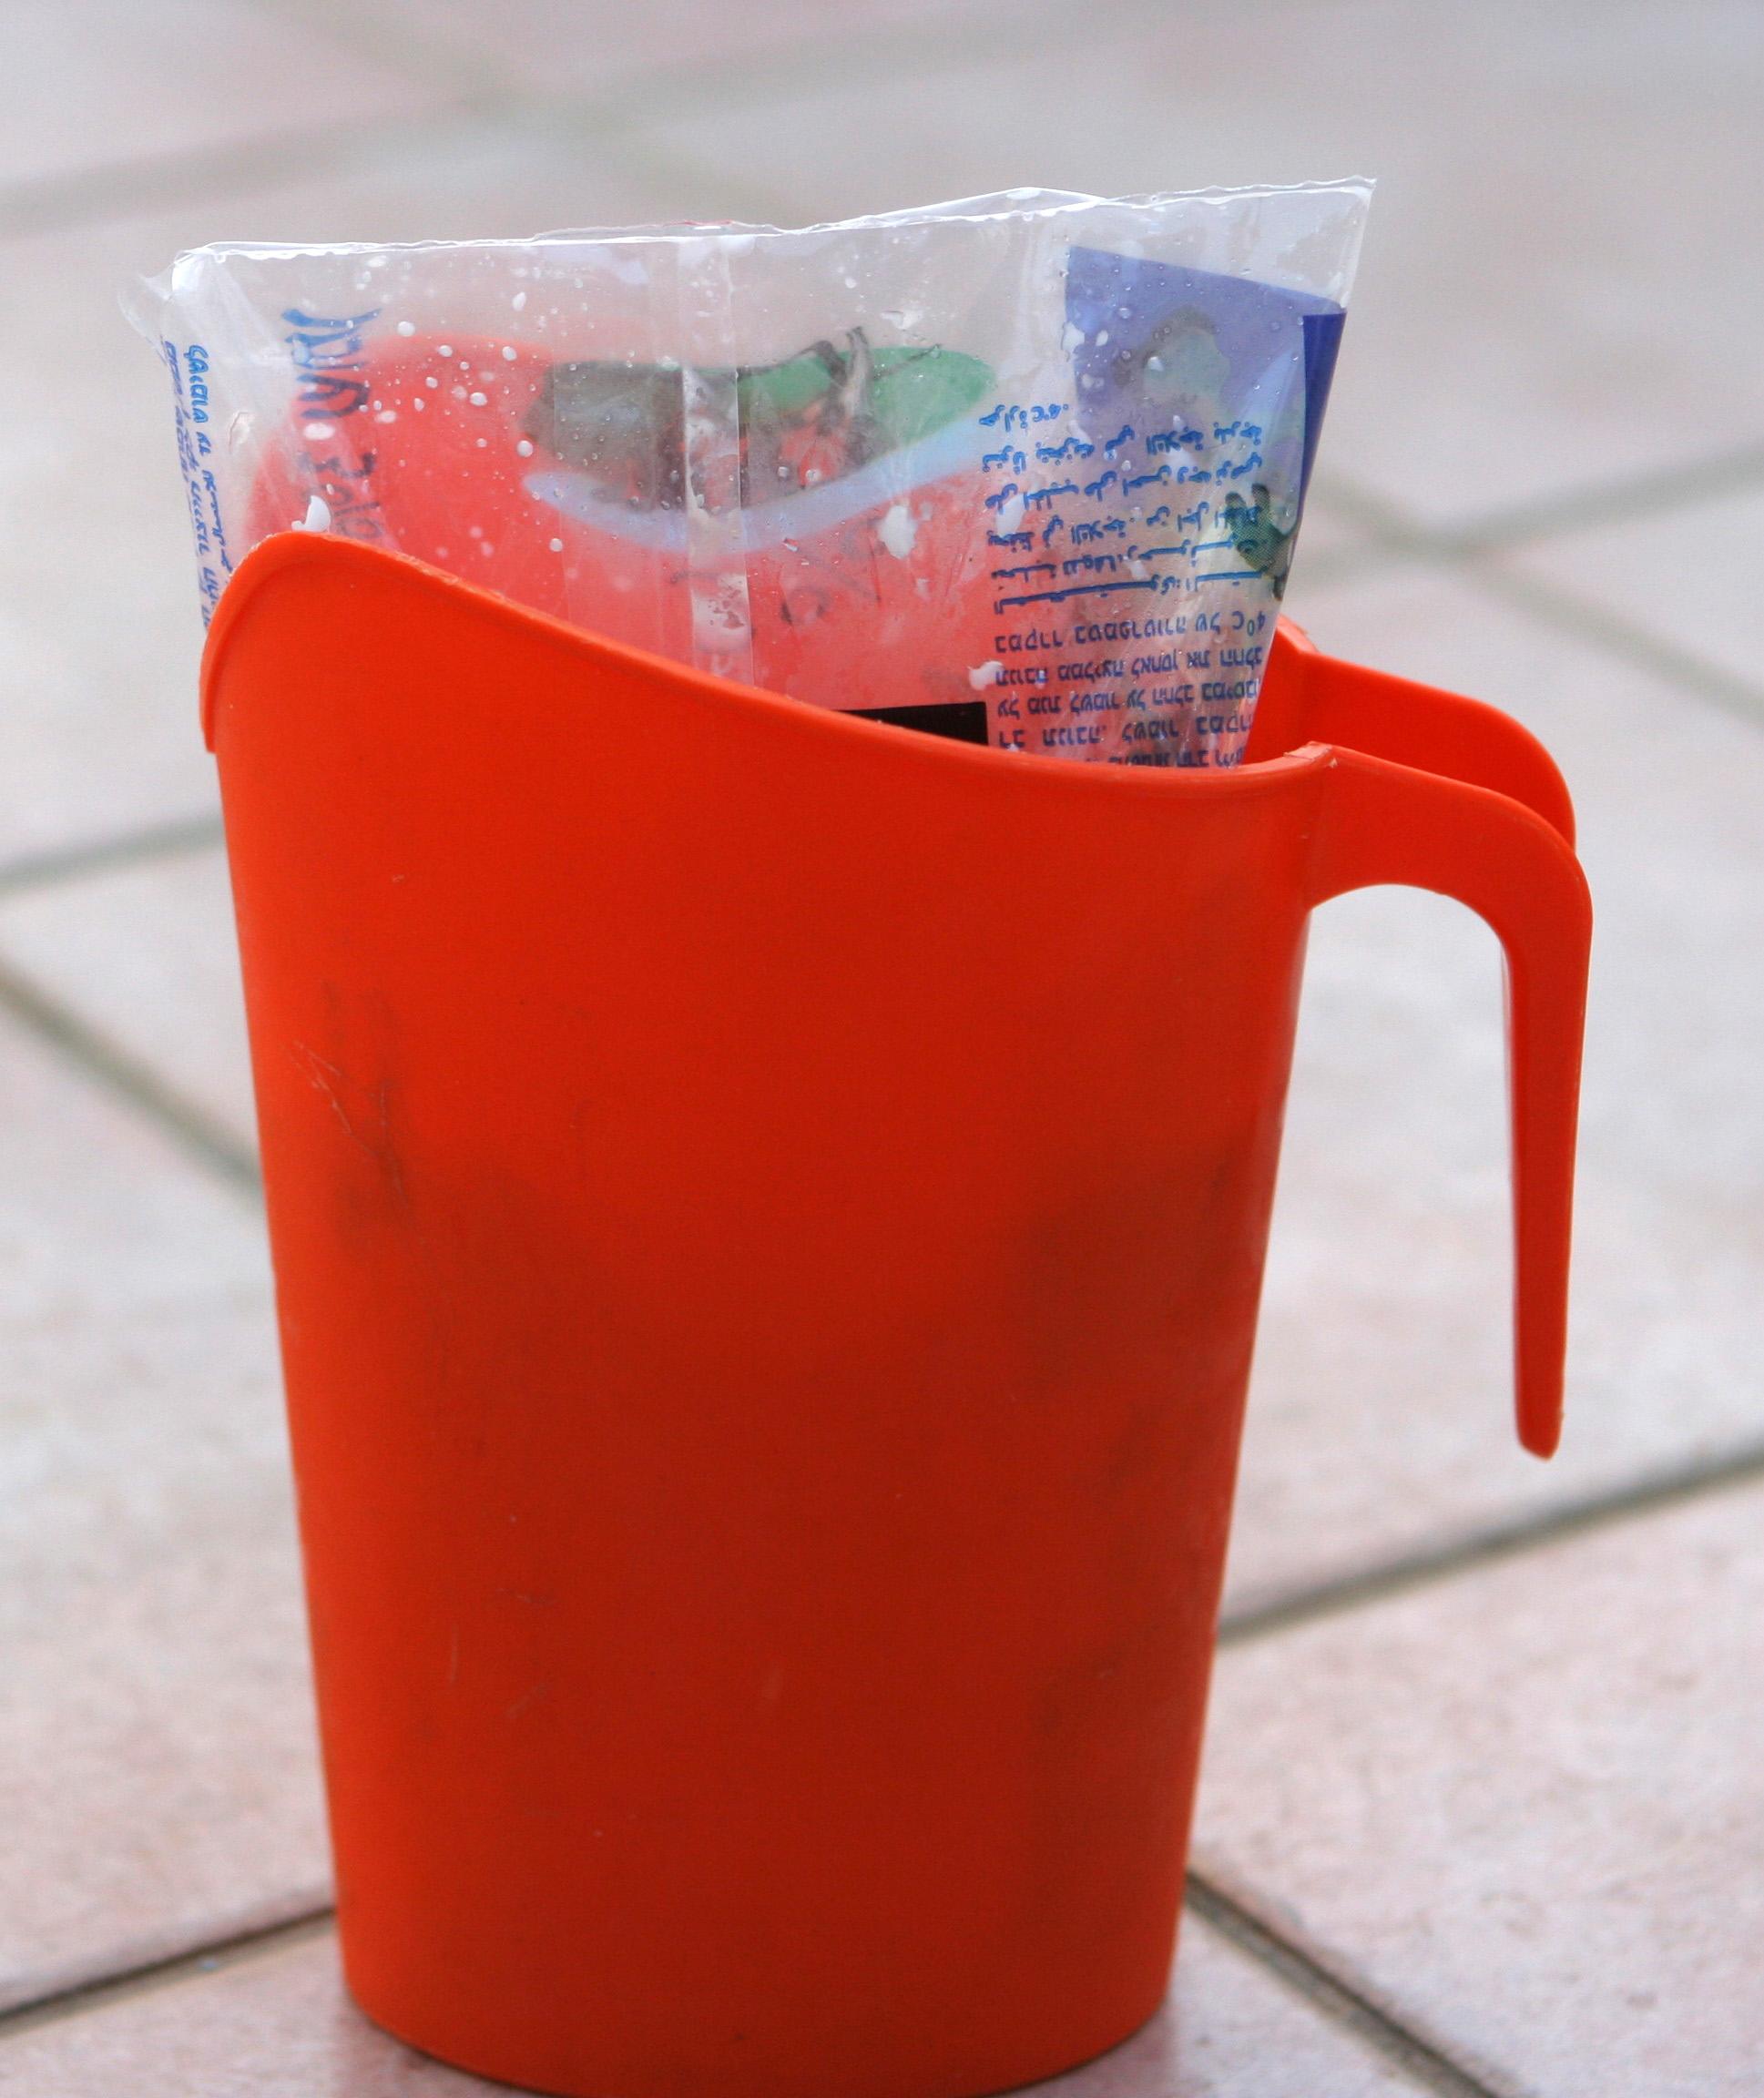 Milk_Bag_Plastic_Pitcher.jpg